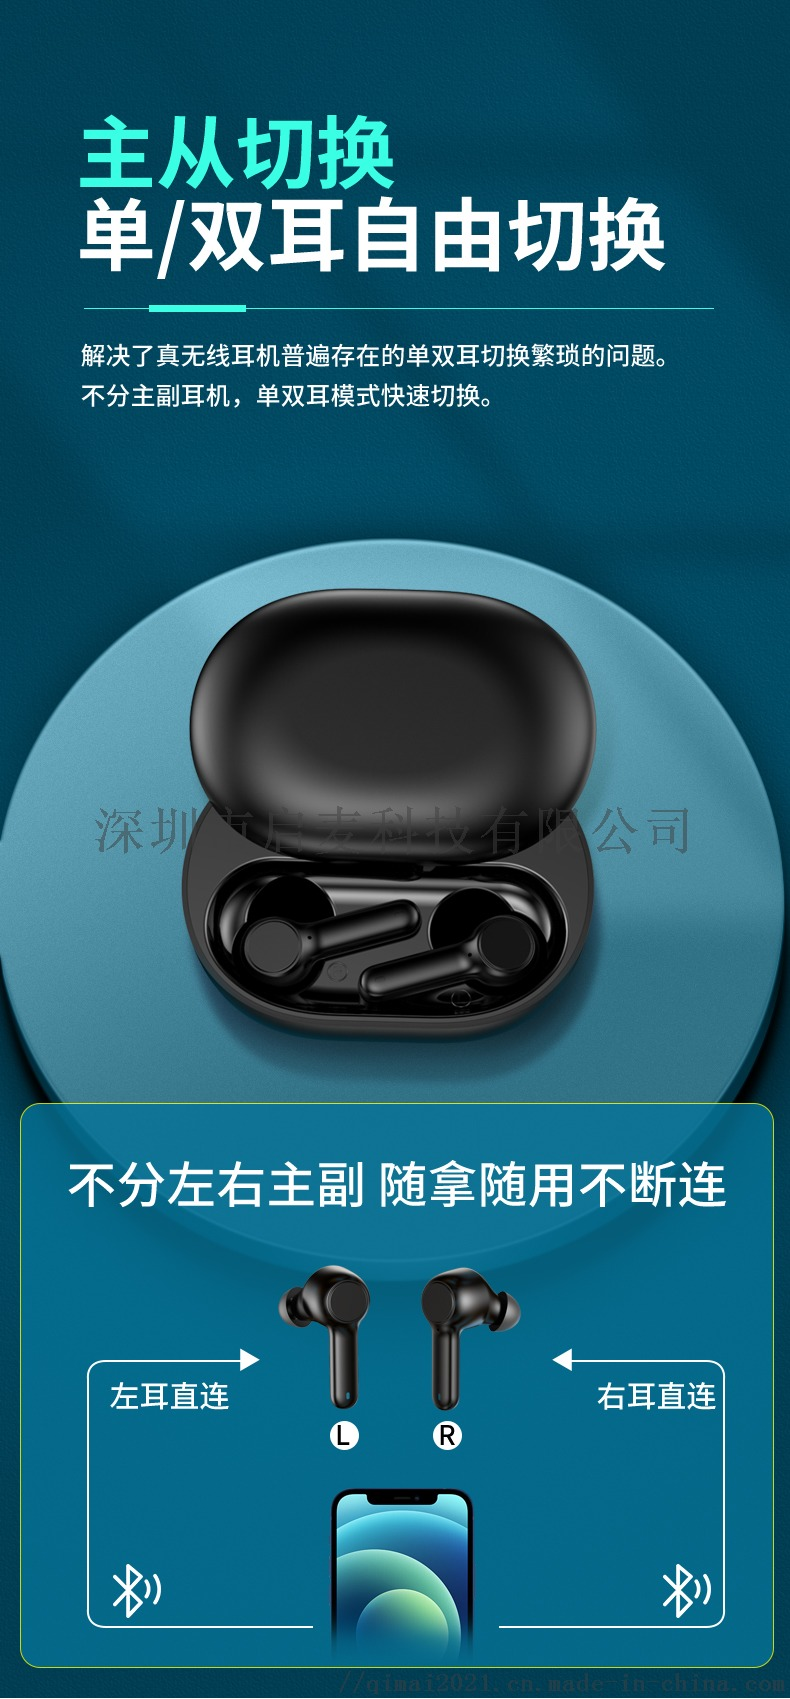 L2蓝牙降噪耳机中文版_05.jpg